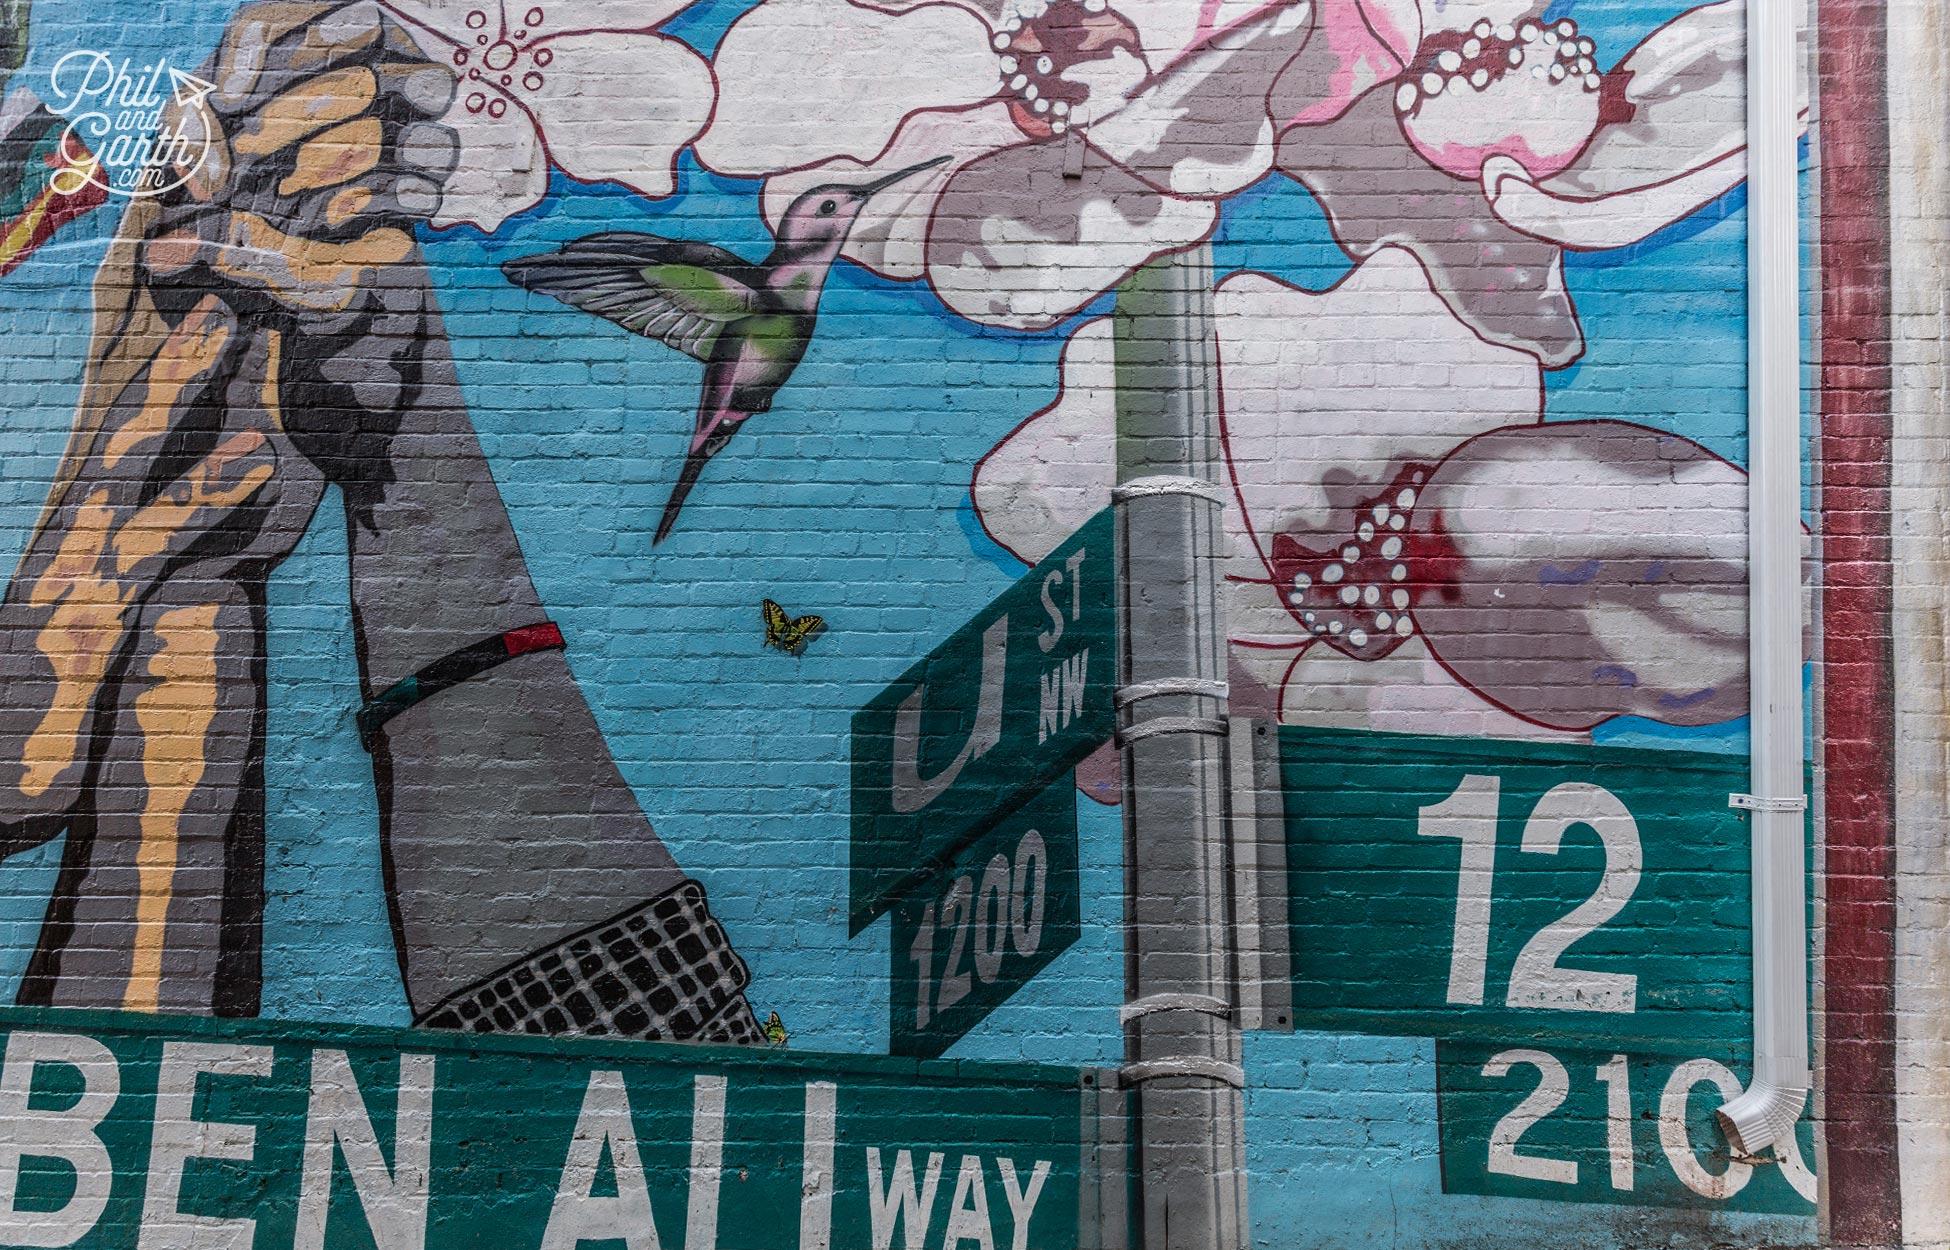 Street art next to Ben's Chili Bowl